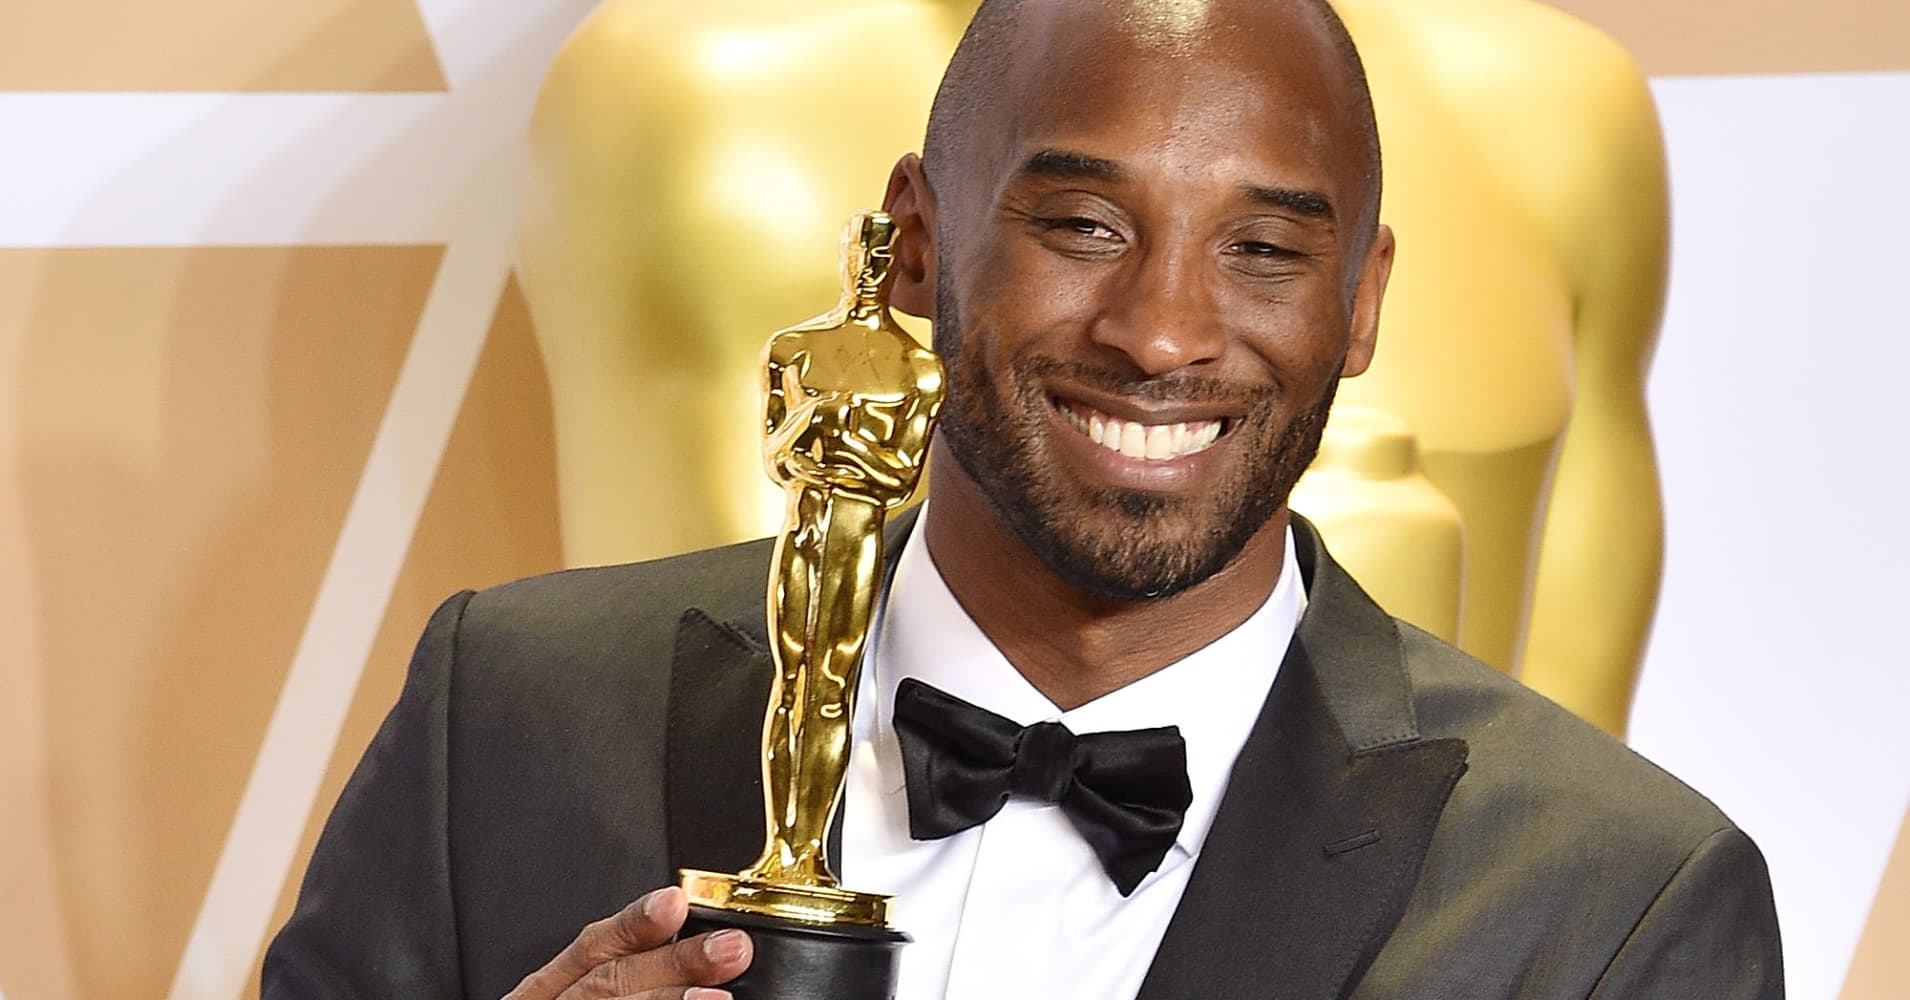 Kobe Bryant won an Oscar for the Best Animated Short Film